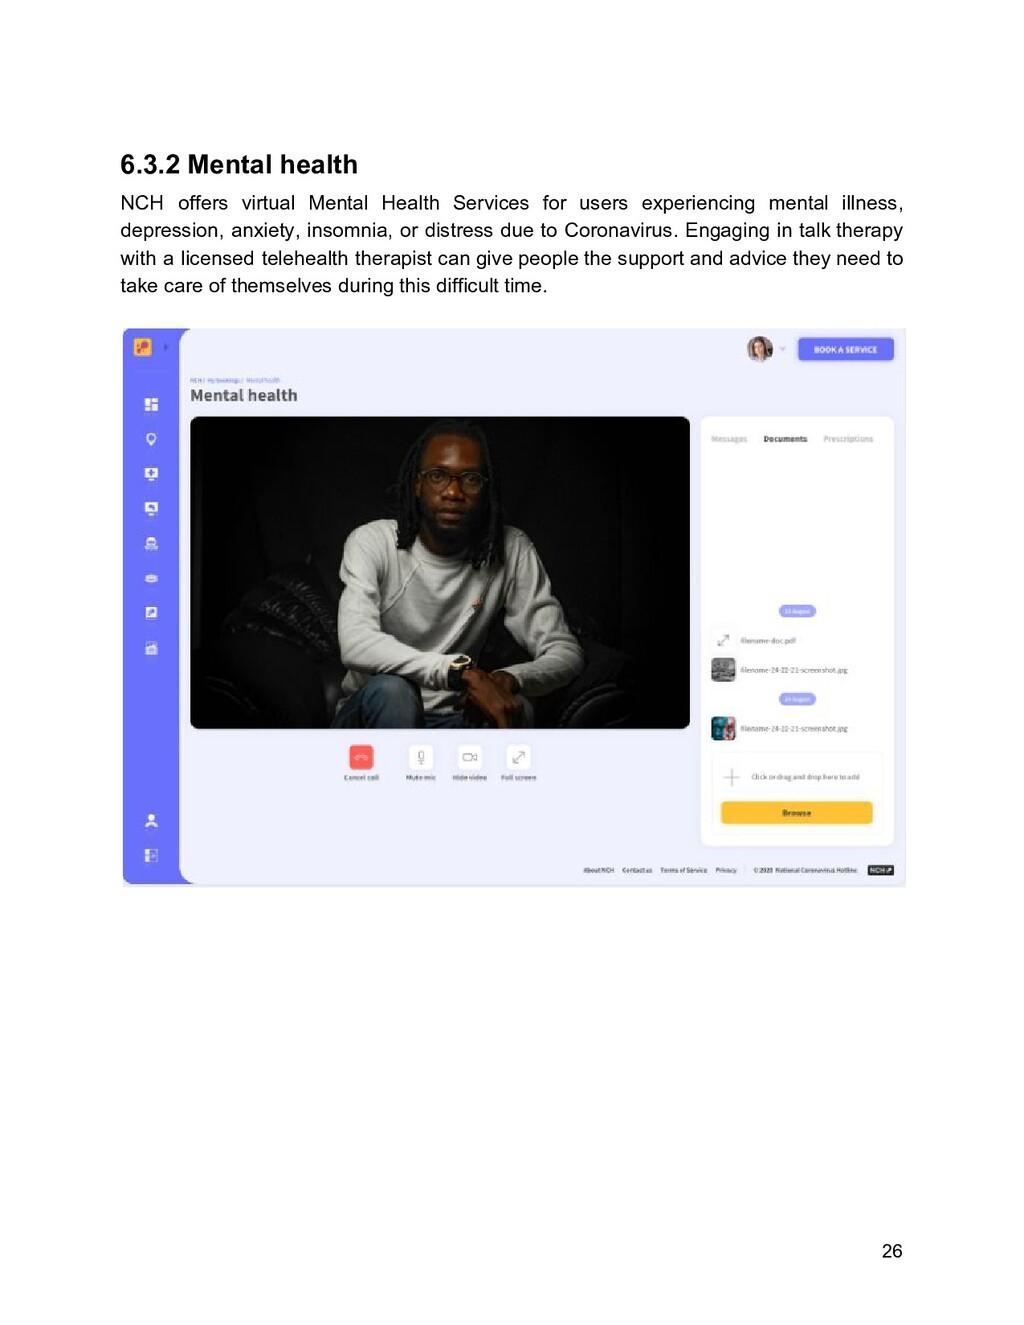 6.3.2 Mental health NCH offers virtual Mental H...